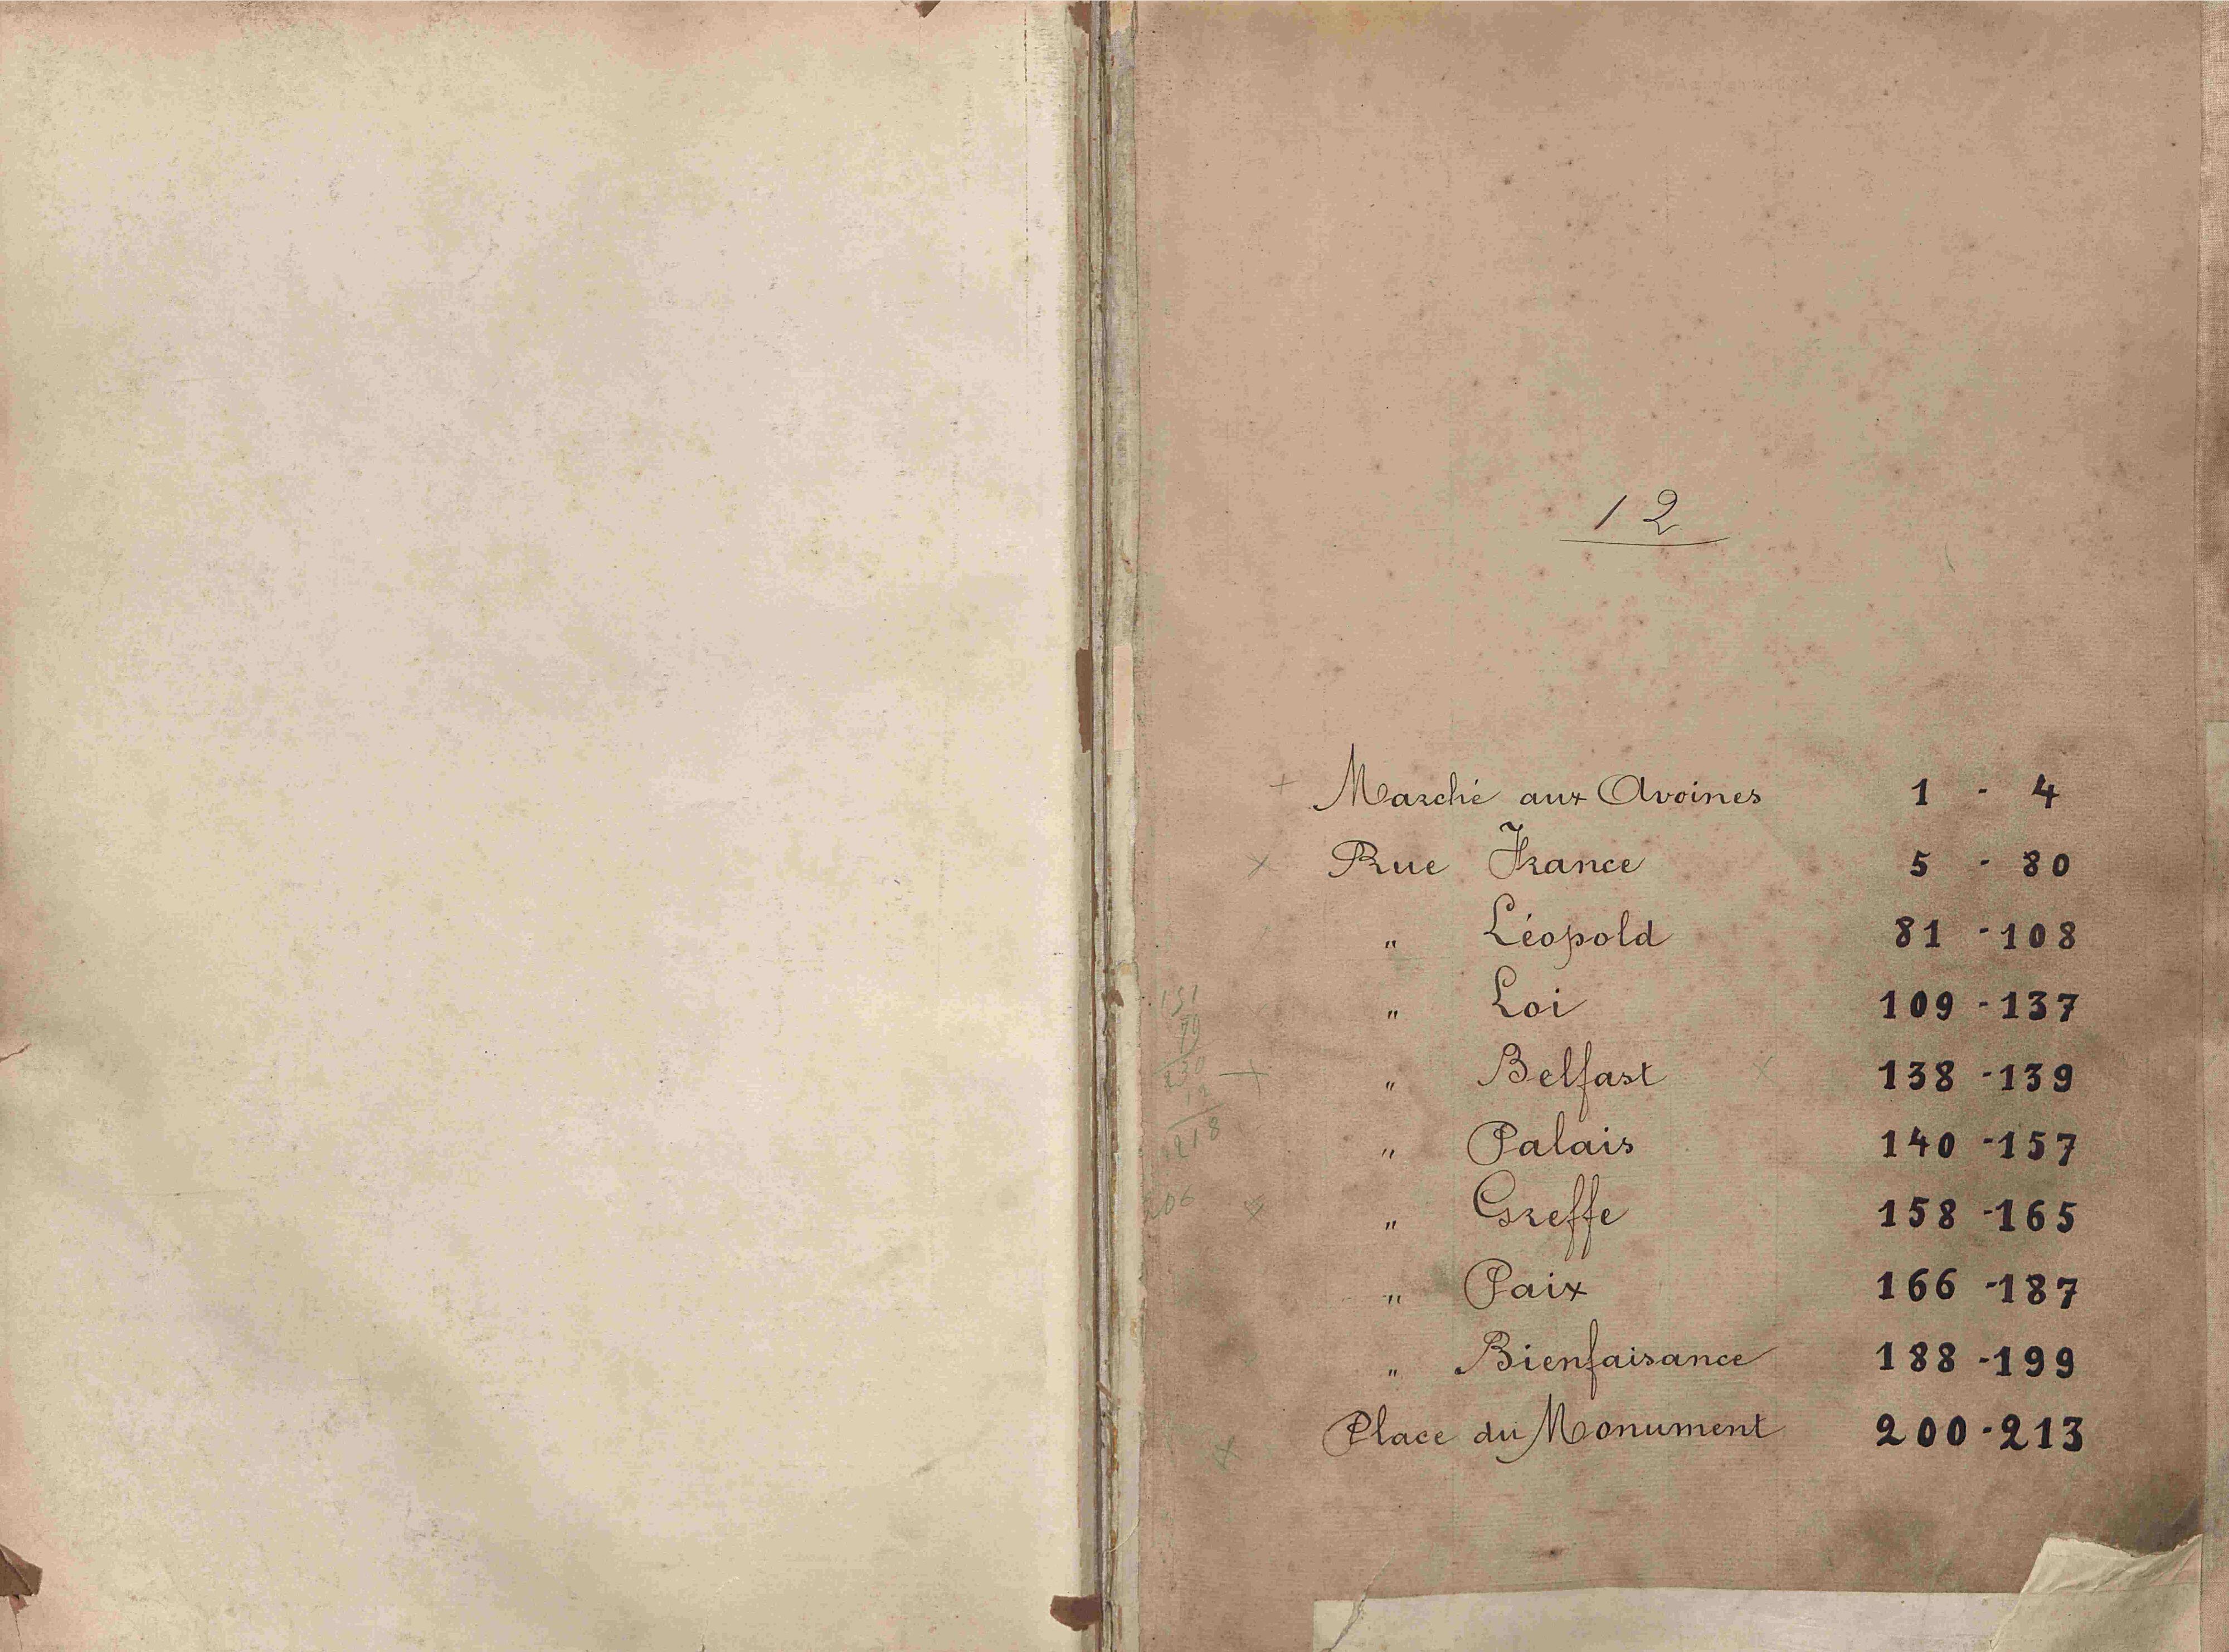 Bevolkingsregister Kortrijk 1890 boek 12